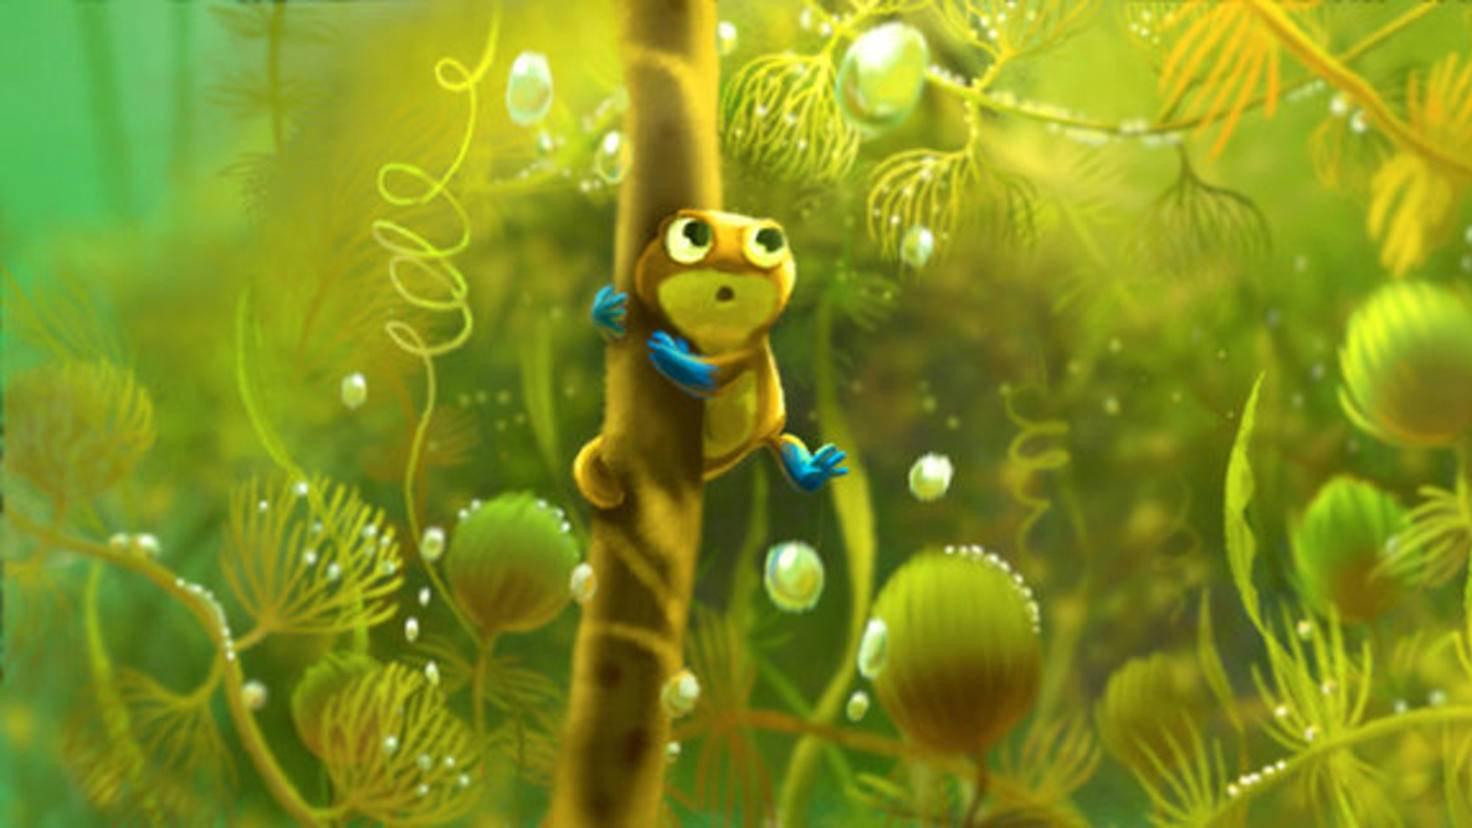 Newt_Film_Facebook_DisneyPixar.jpg